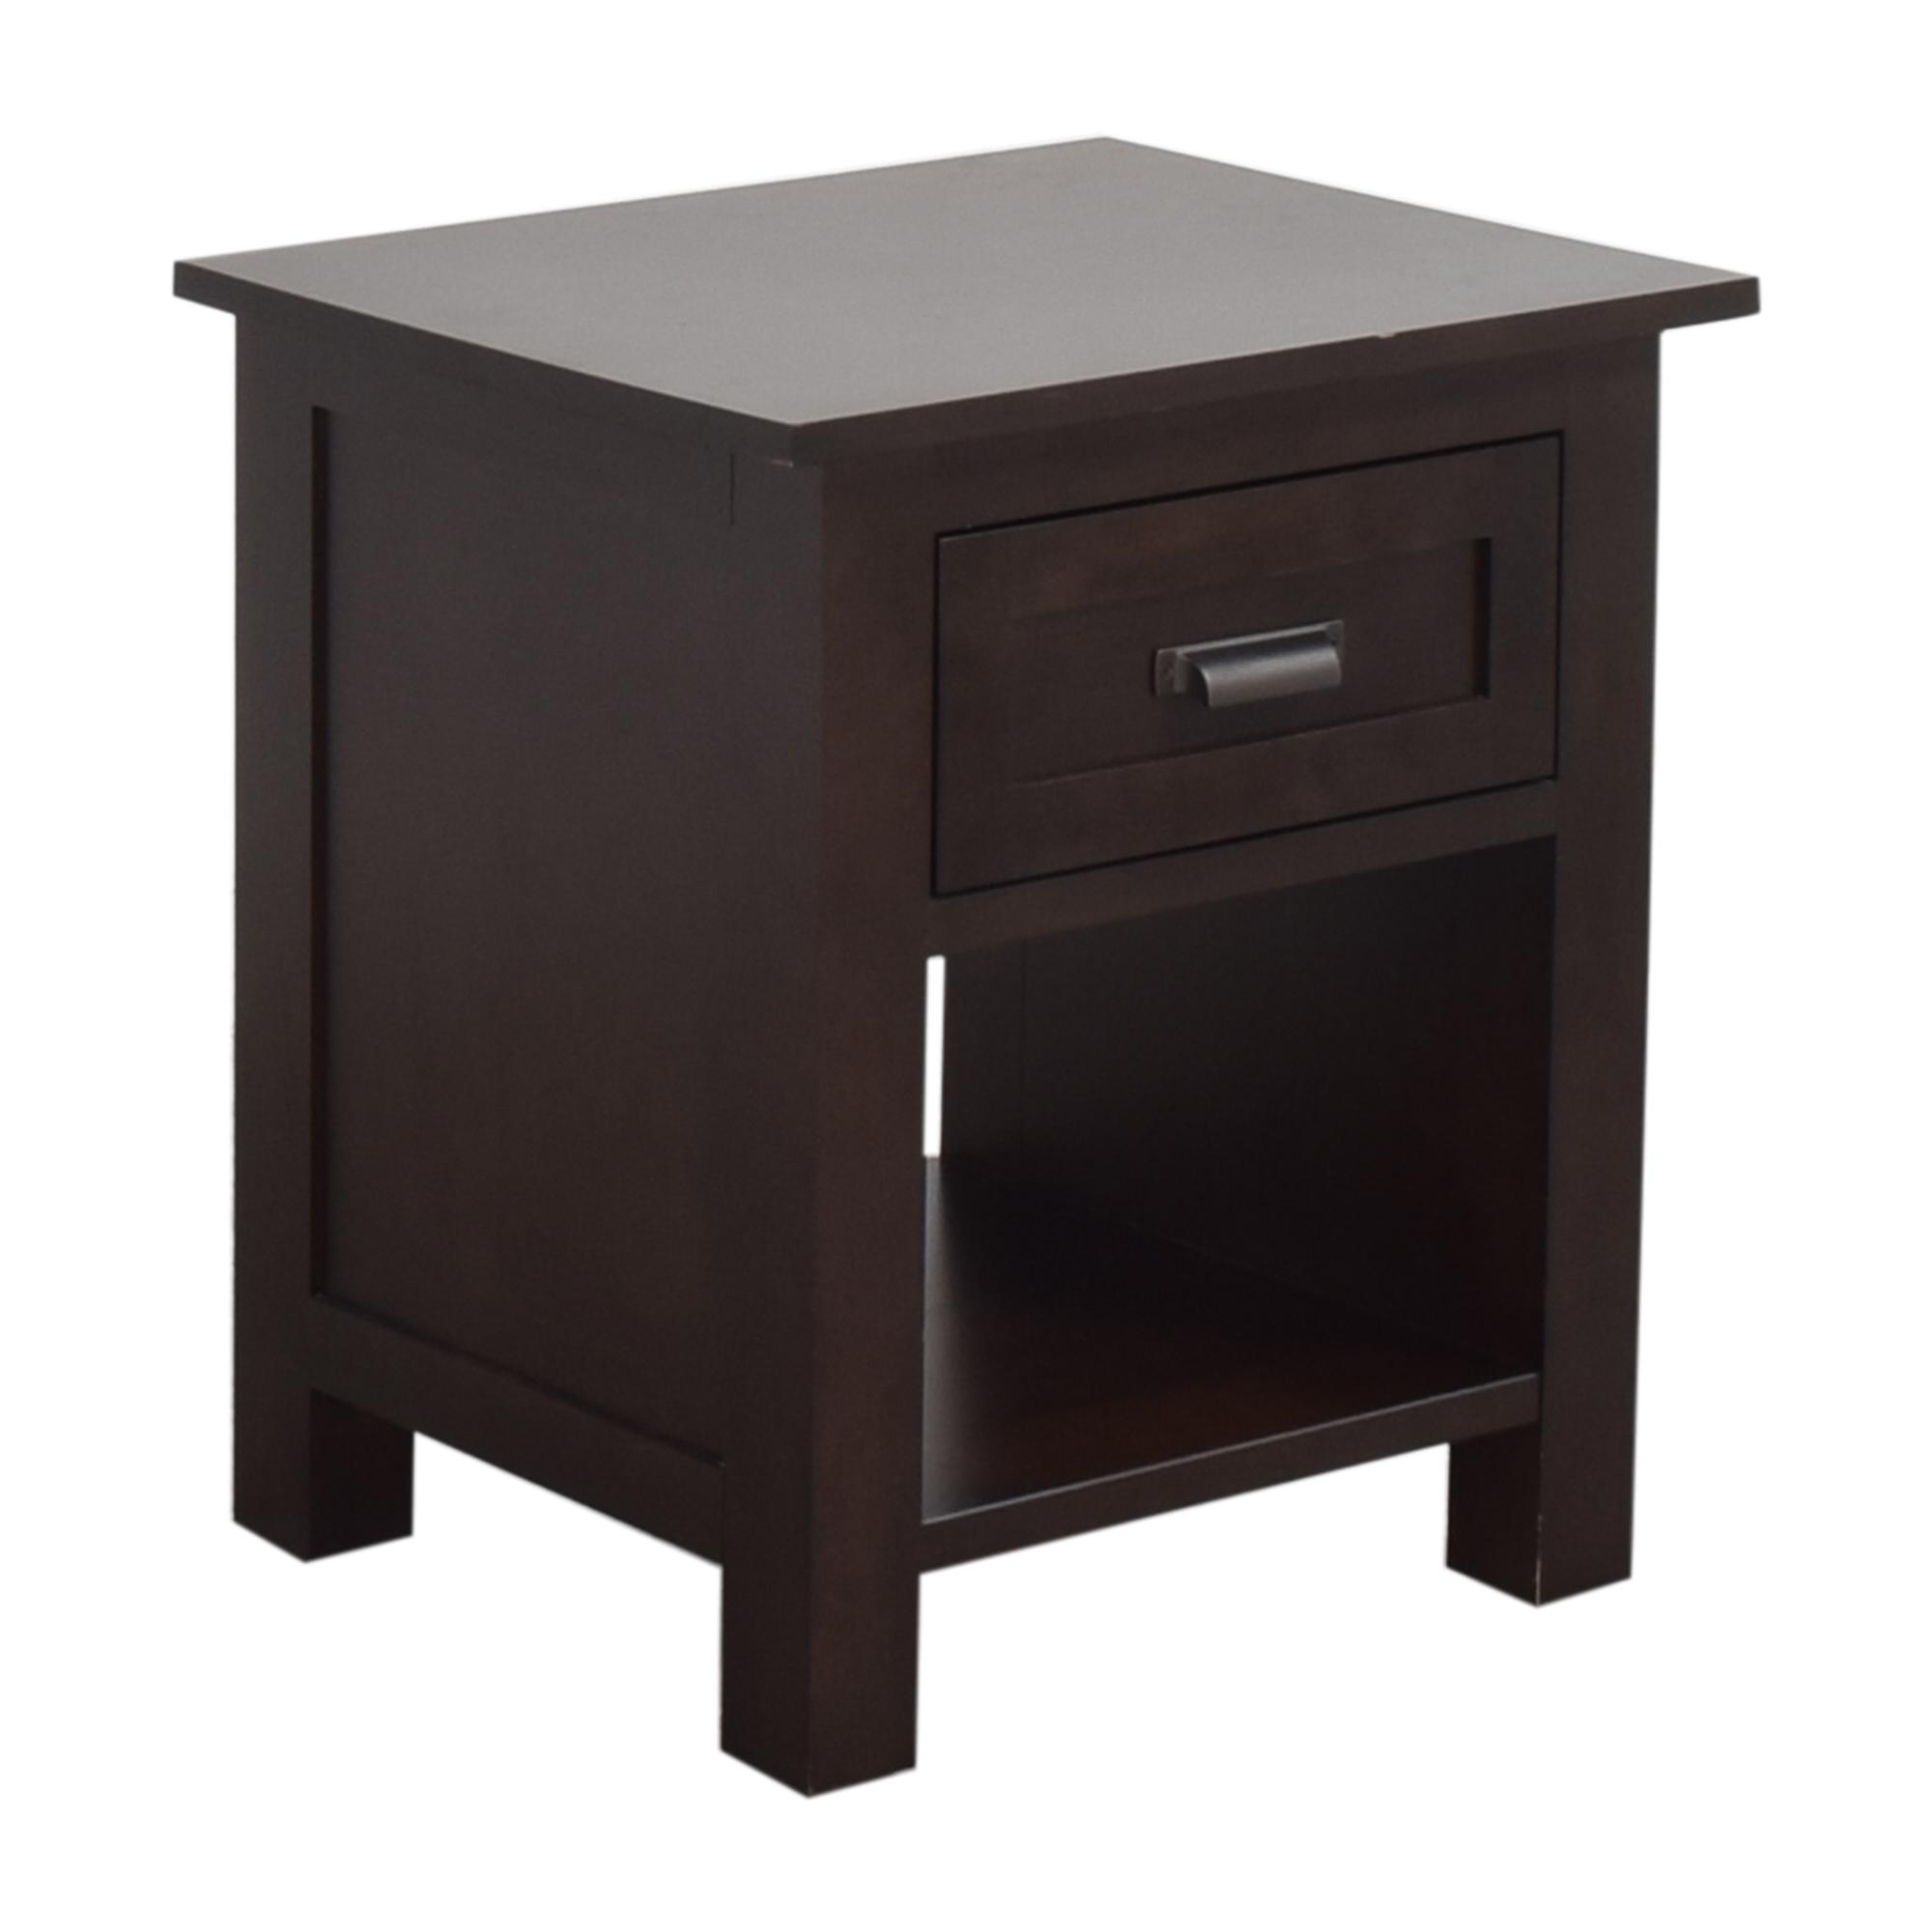 Room & Board Room & Board Bennett One Drawer Nightstand on sale